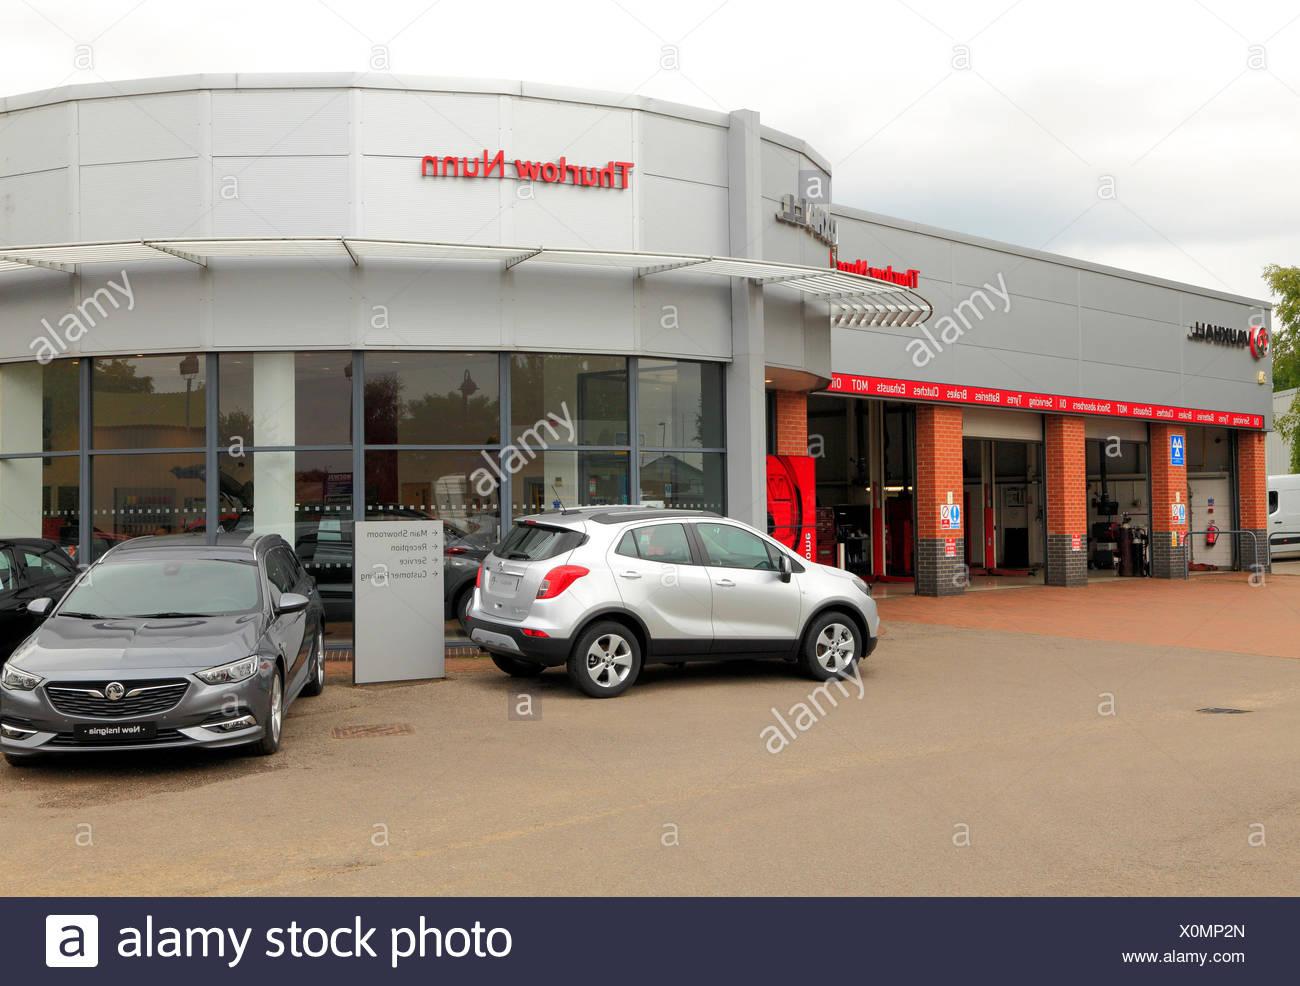 Thurlow Nunn, Fakenham, Norfolk, Vauxhall motor cars, vehicles, main dealer, dealers, dealership, dealerships, England, UK - Stock Image